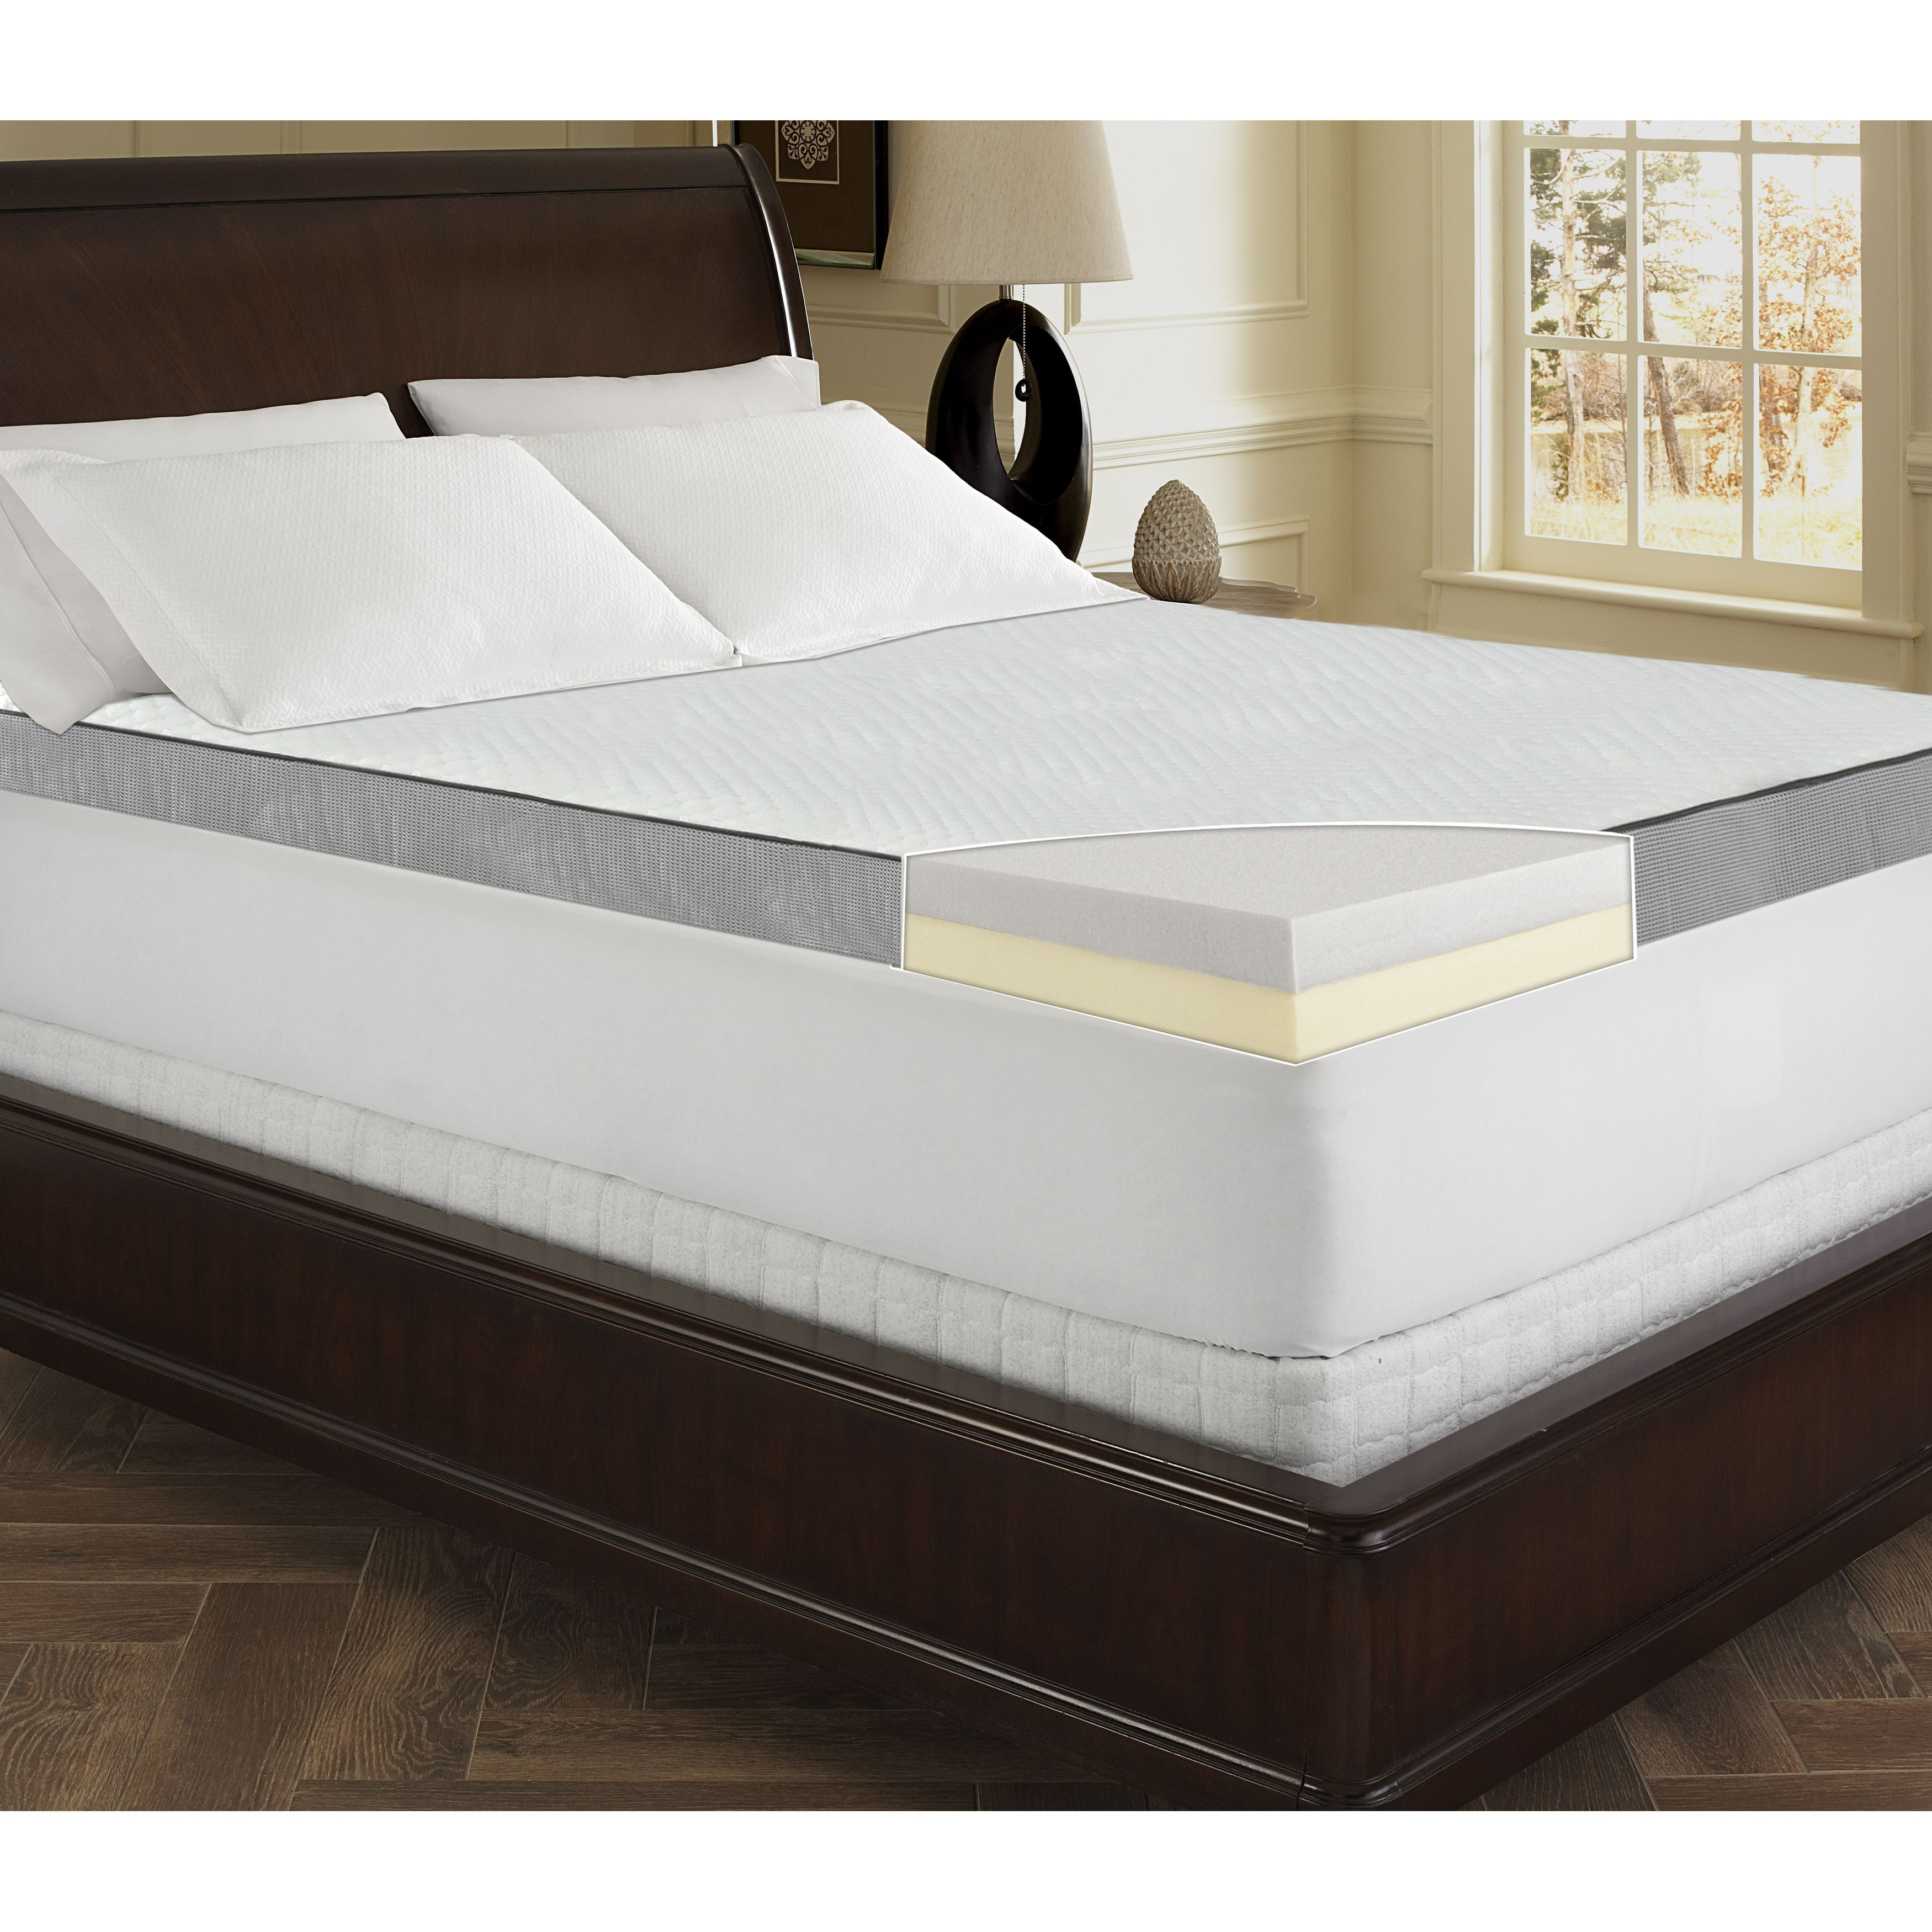 Usa Sinomax Sleep 4 Inch Ultra Layered Memory Foam Mattress Topper Futon Covers